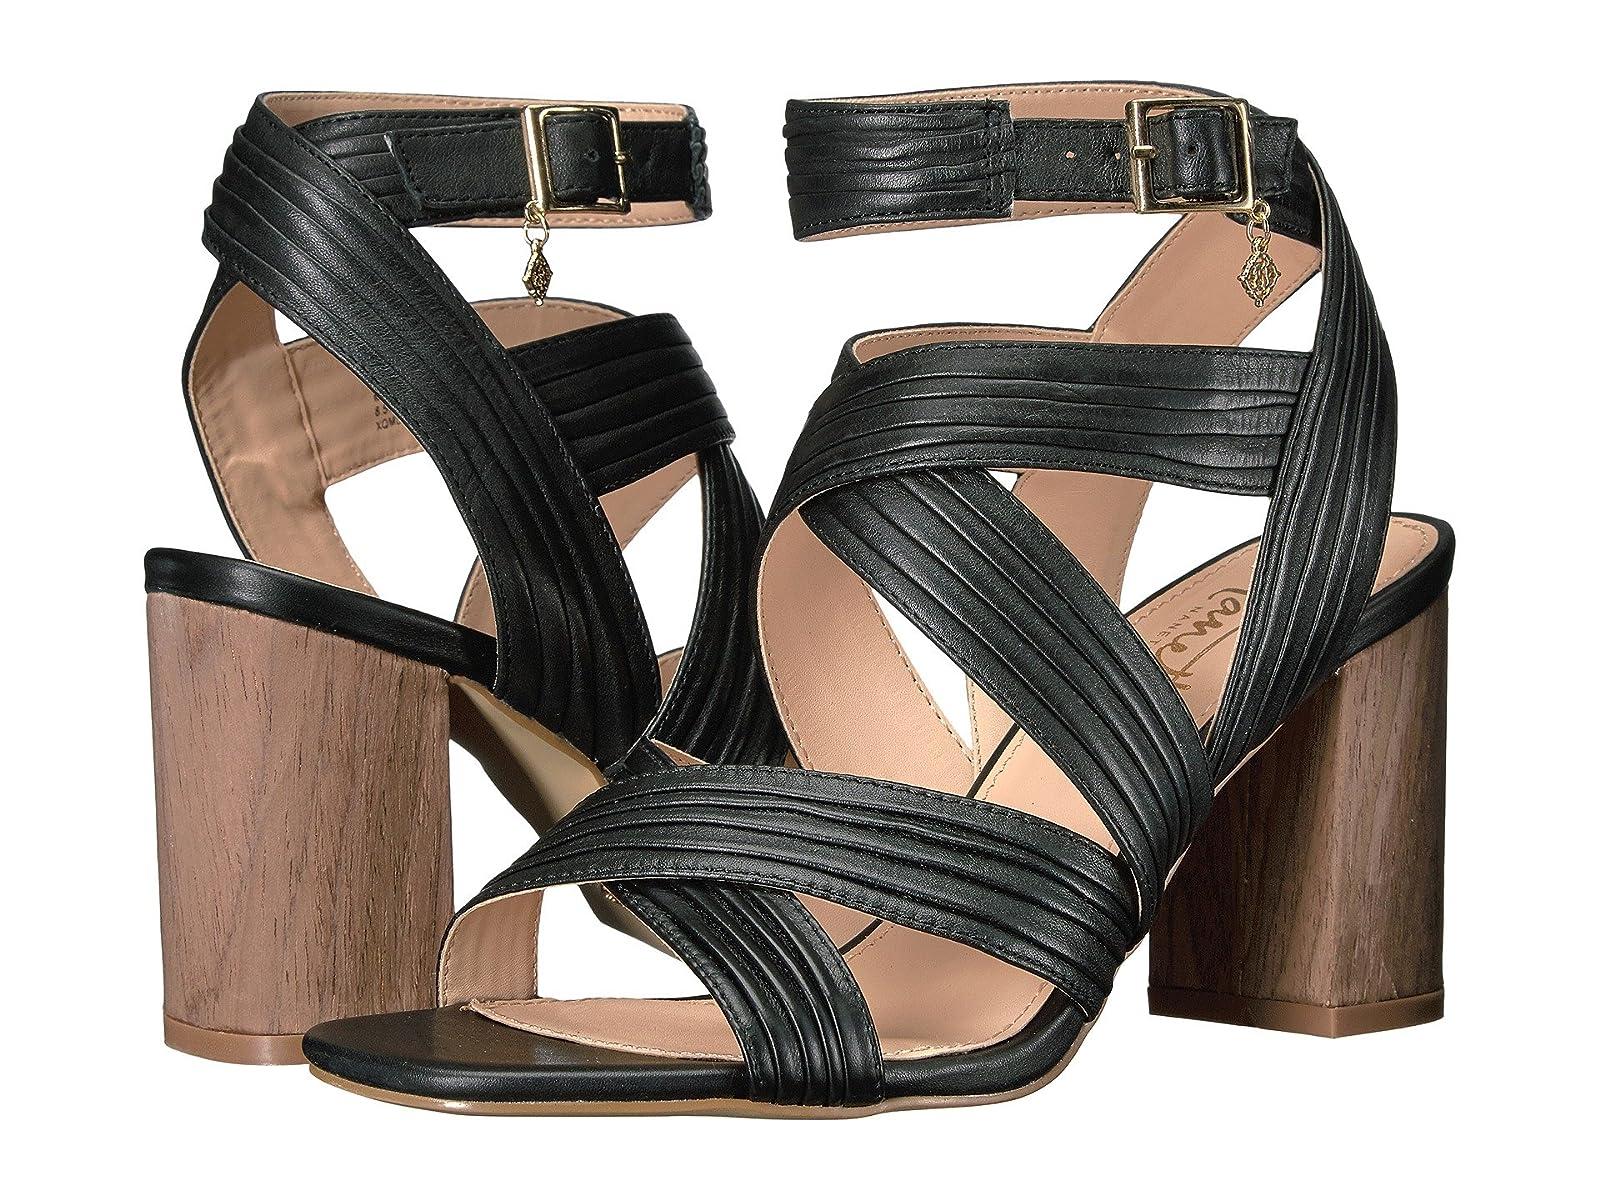 Nanette nanette lepore Trisha-NLCheap and distinctive eye-catching shoes